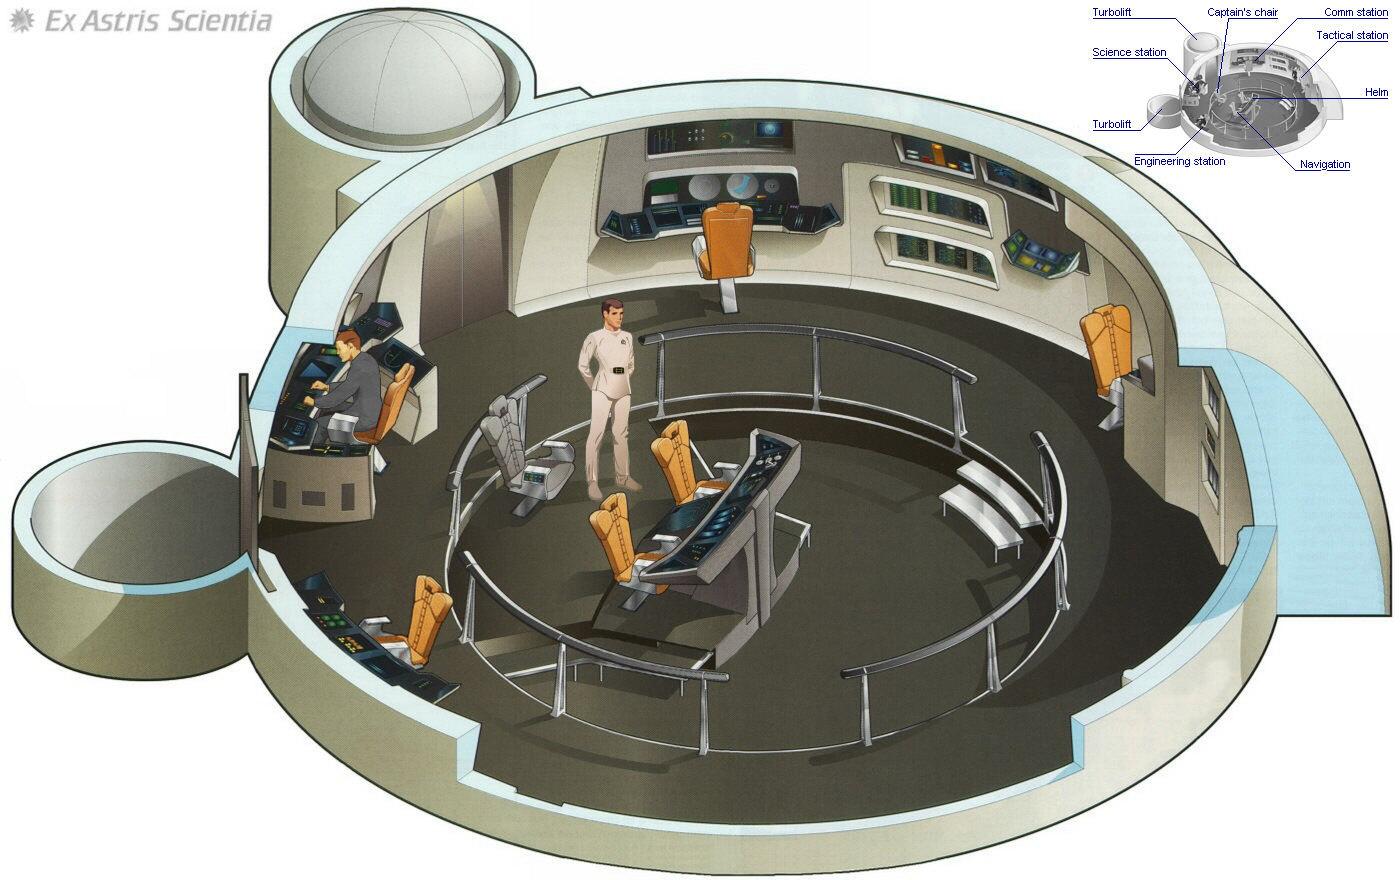 Ex Astris Scientia Galleries Starfleet Bridge Illustrations Star Trek Engineering Schematics Constitution Class Refit Uss Enterprise 2271